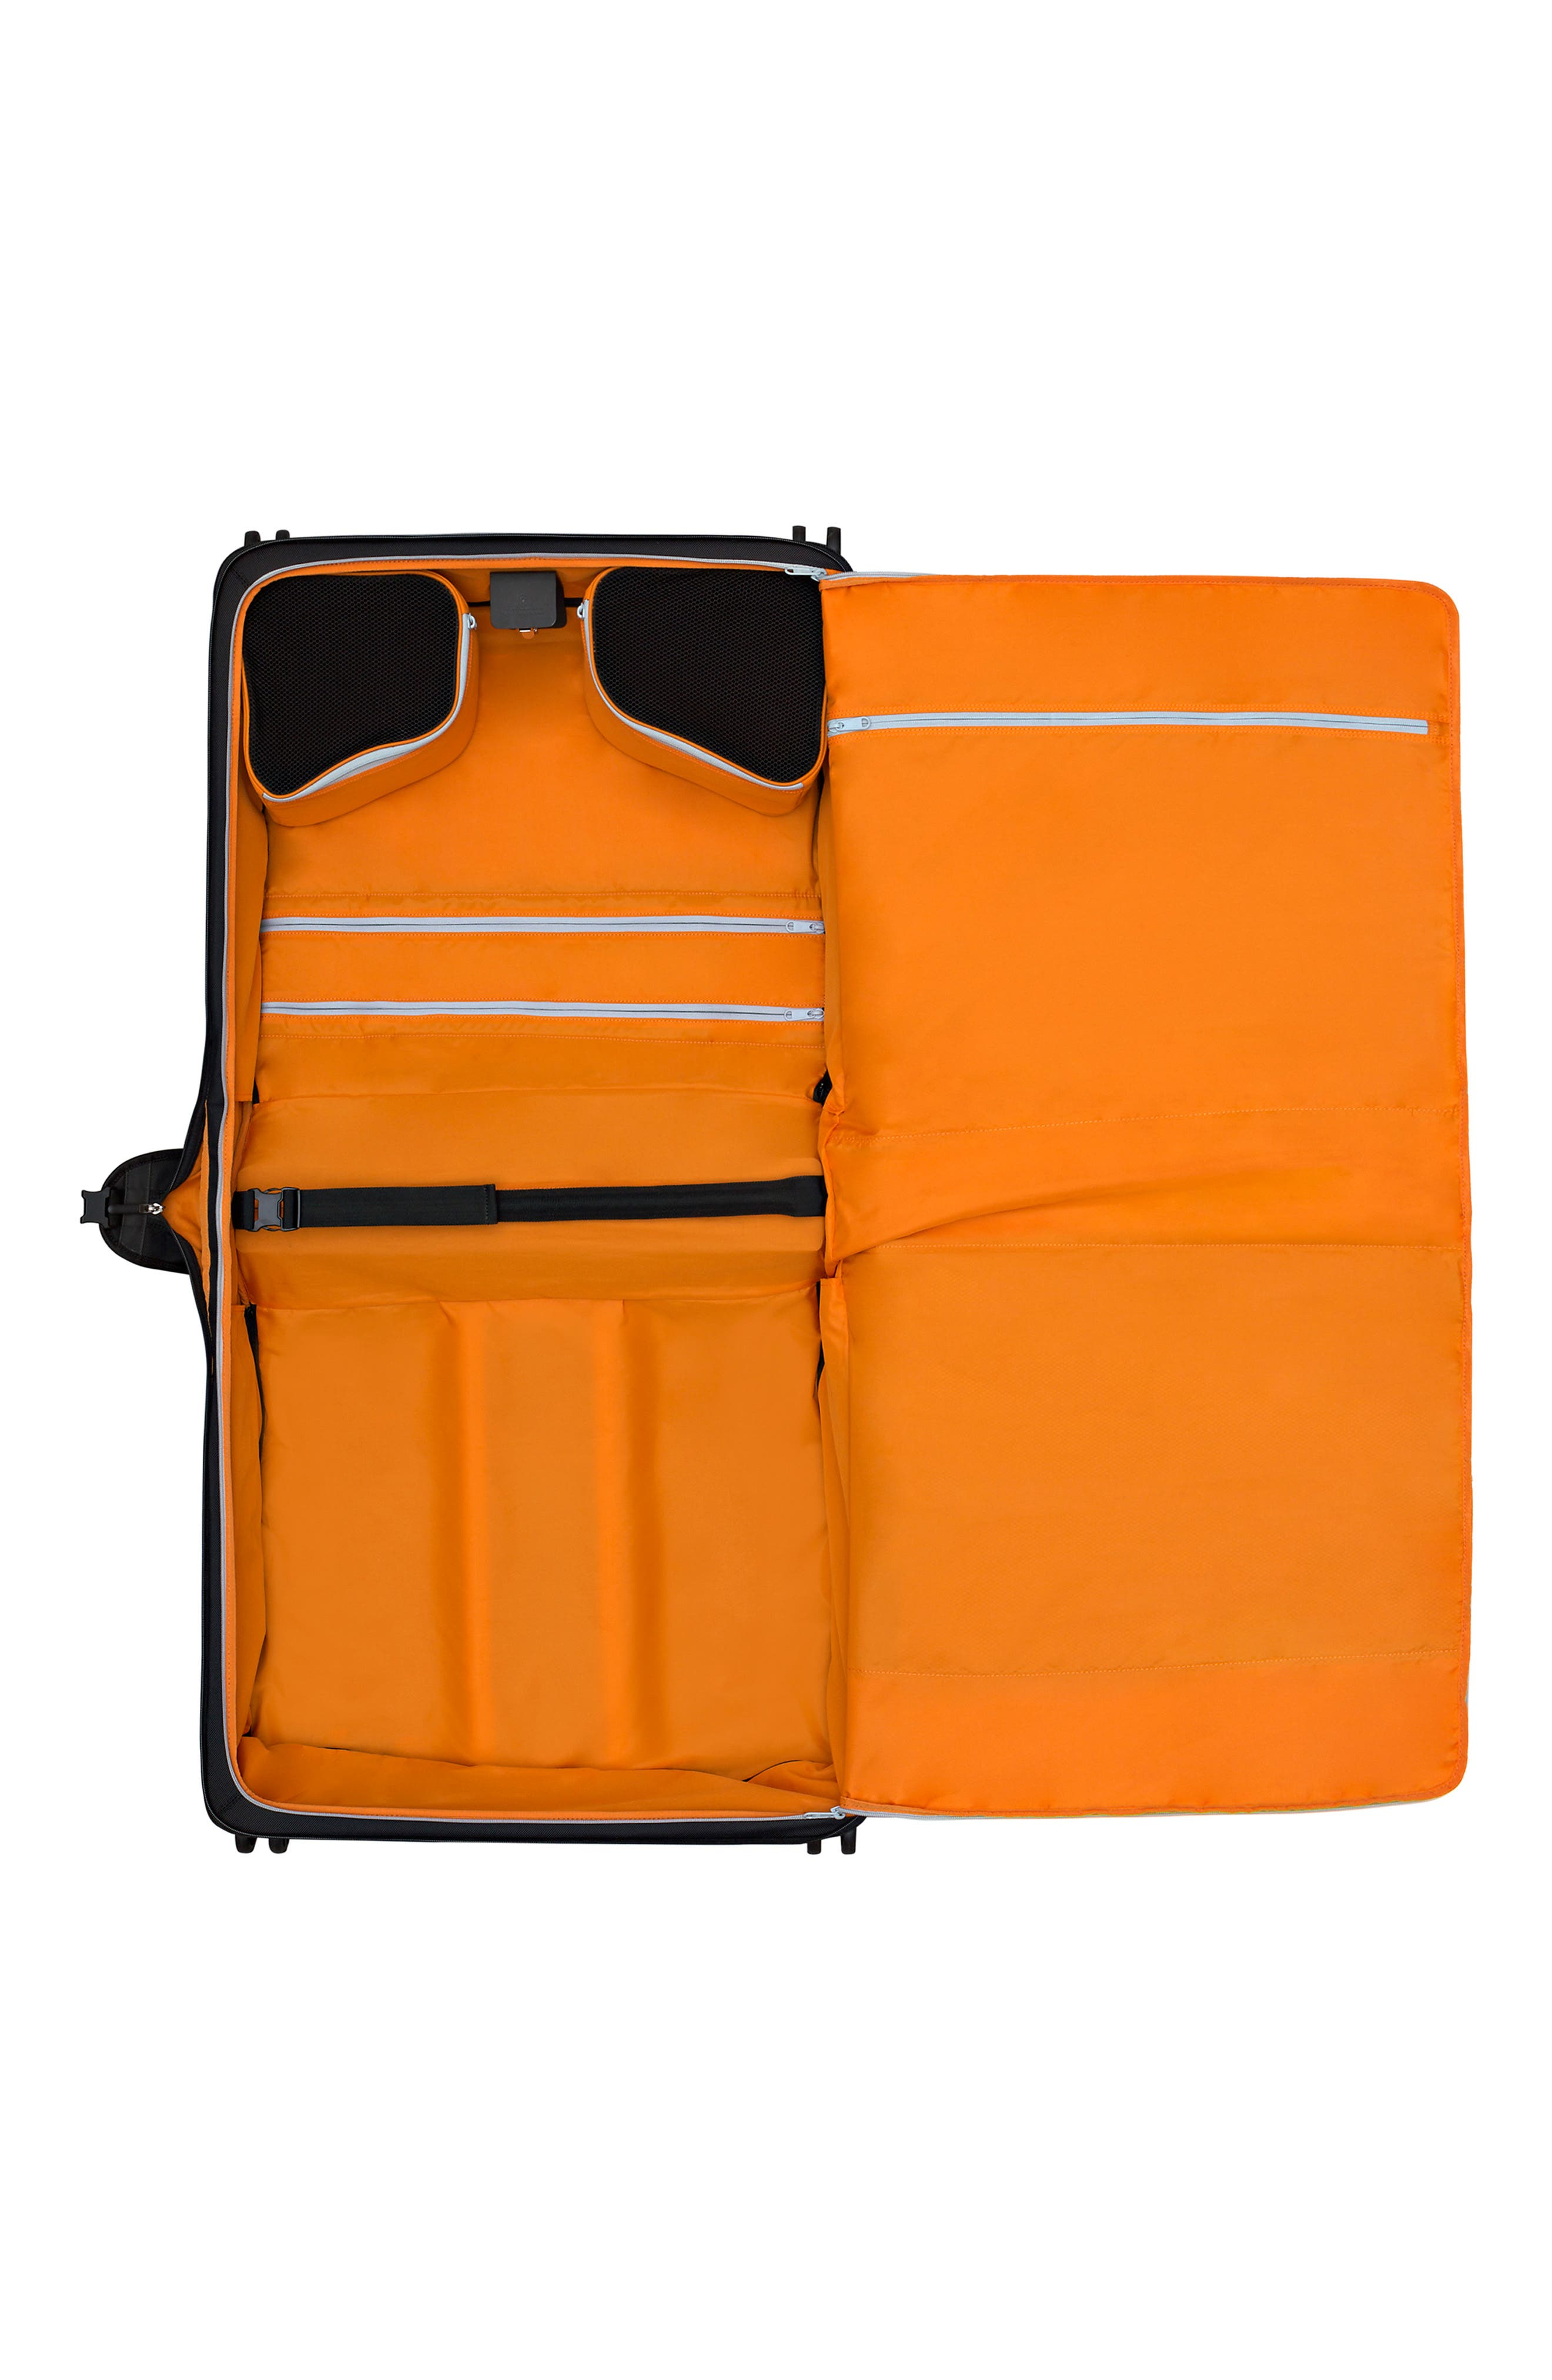 WT 5.0 Dual Caster Wheeled Garment Bag,                             Alternate thumbnail 2, color,                             001